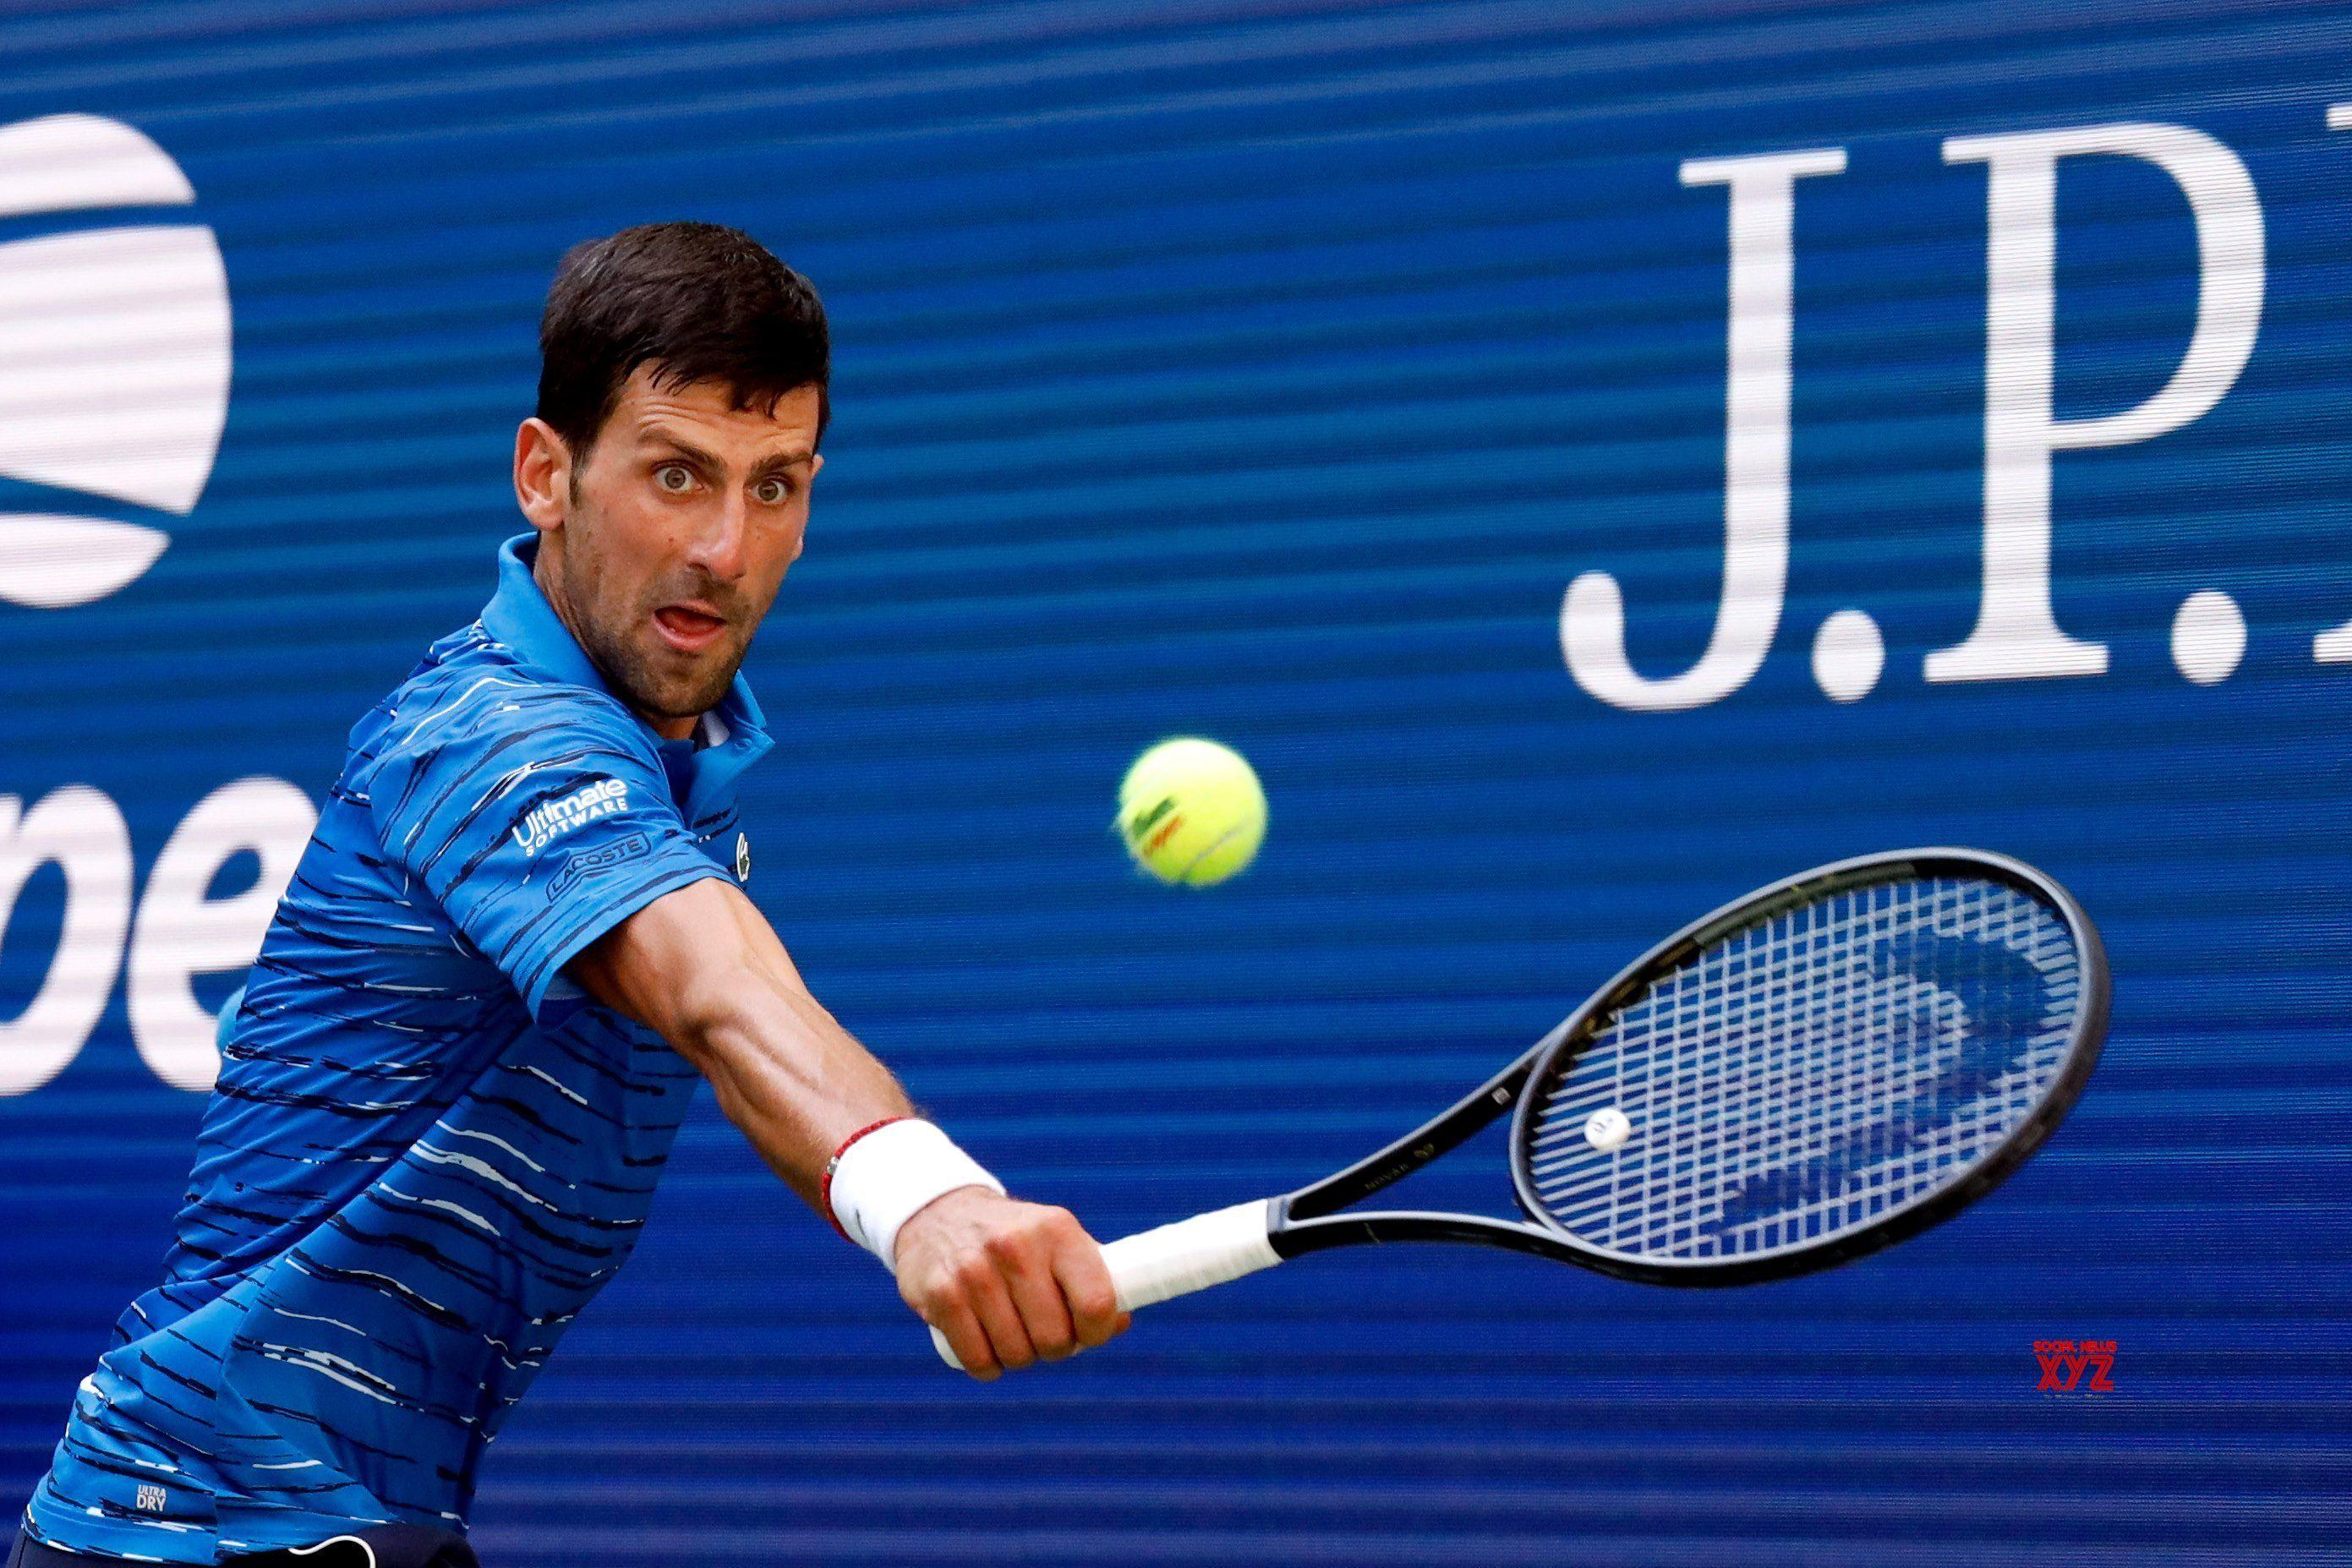 U S New York Tennis Us Open Men S Singles Gallery With Images Tennis New York York